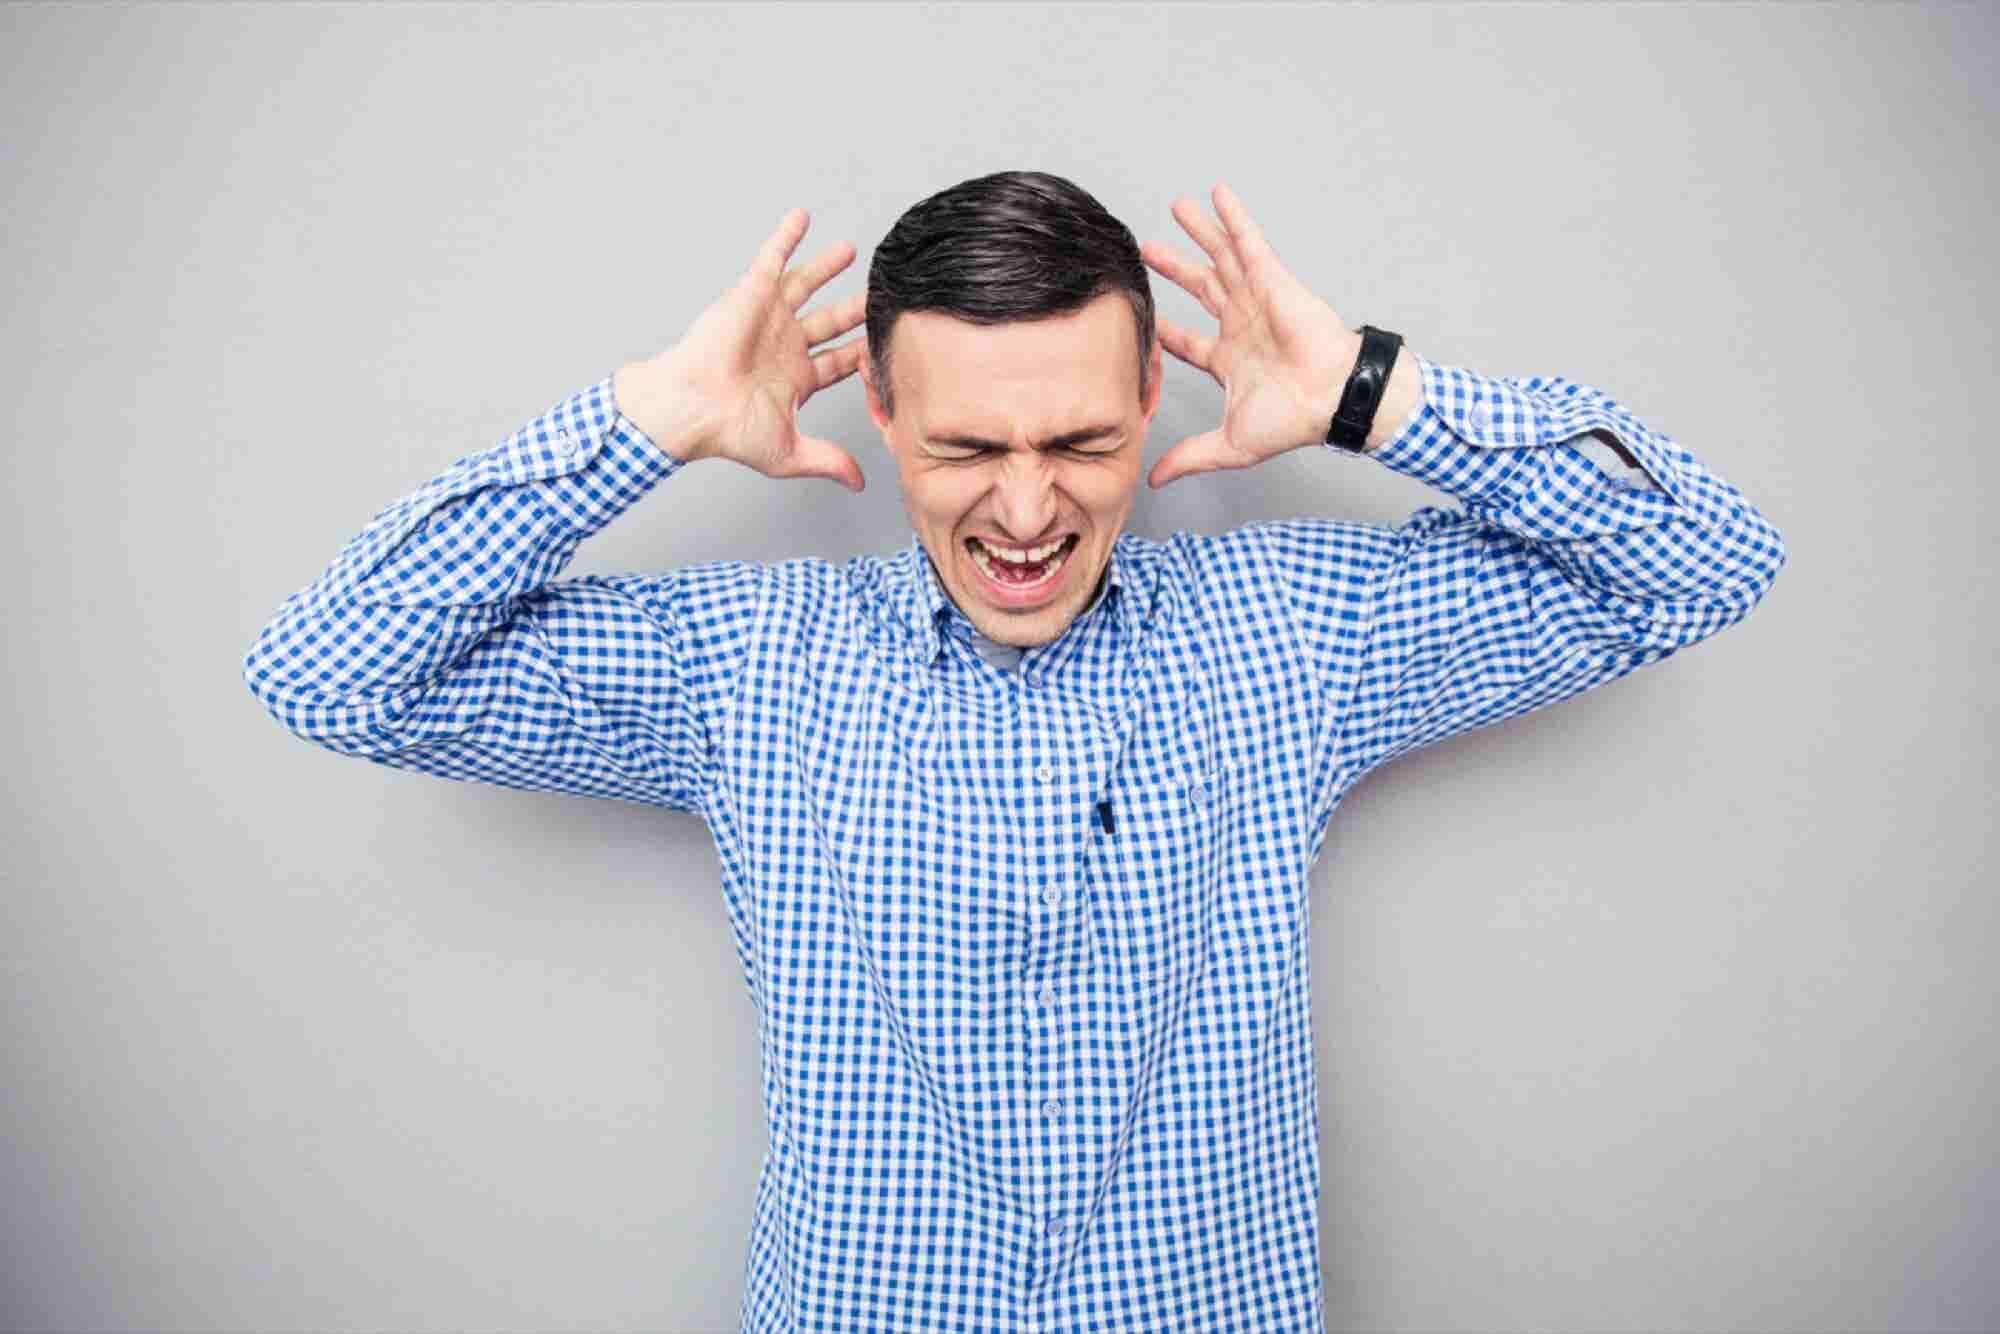 Stress Management In A Creative Sense